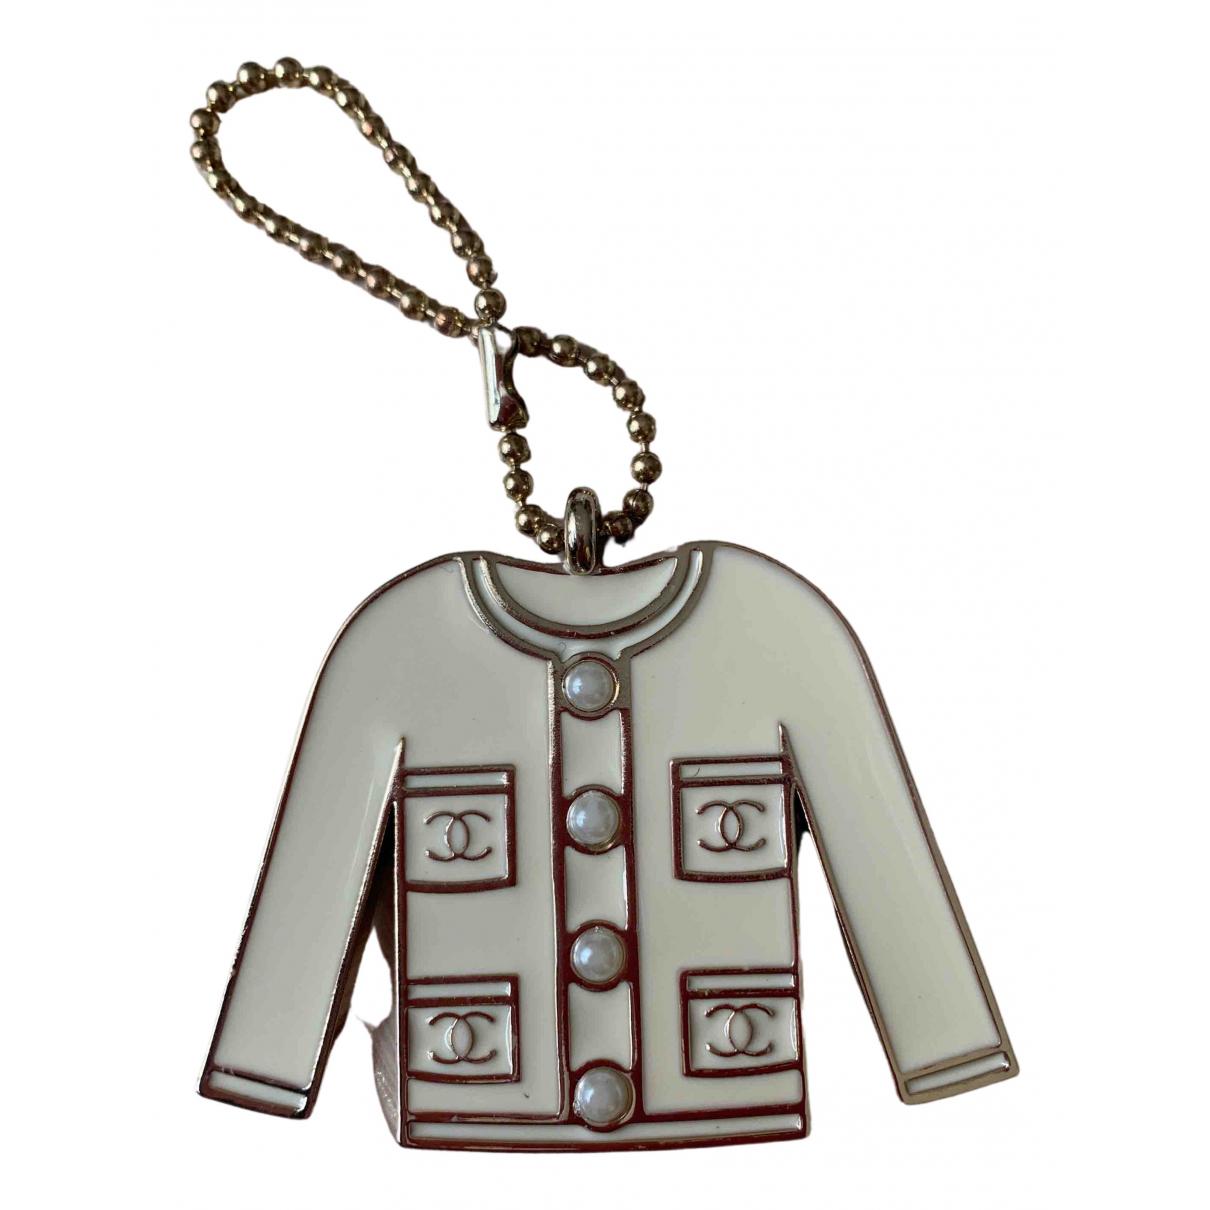 Chanel N Ecru Metal Bag charms for Women N